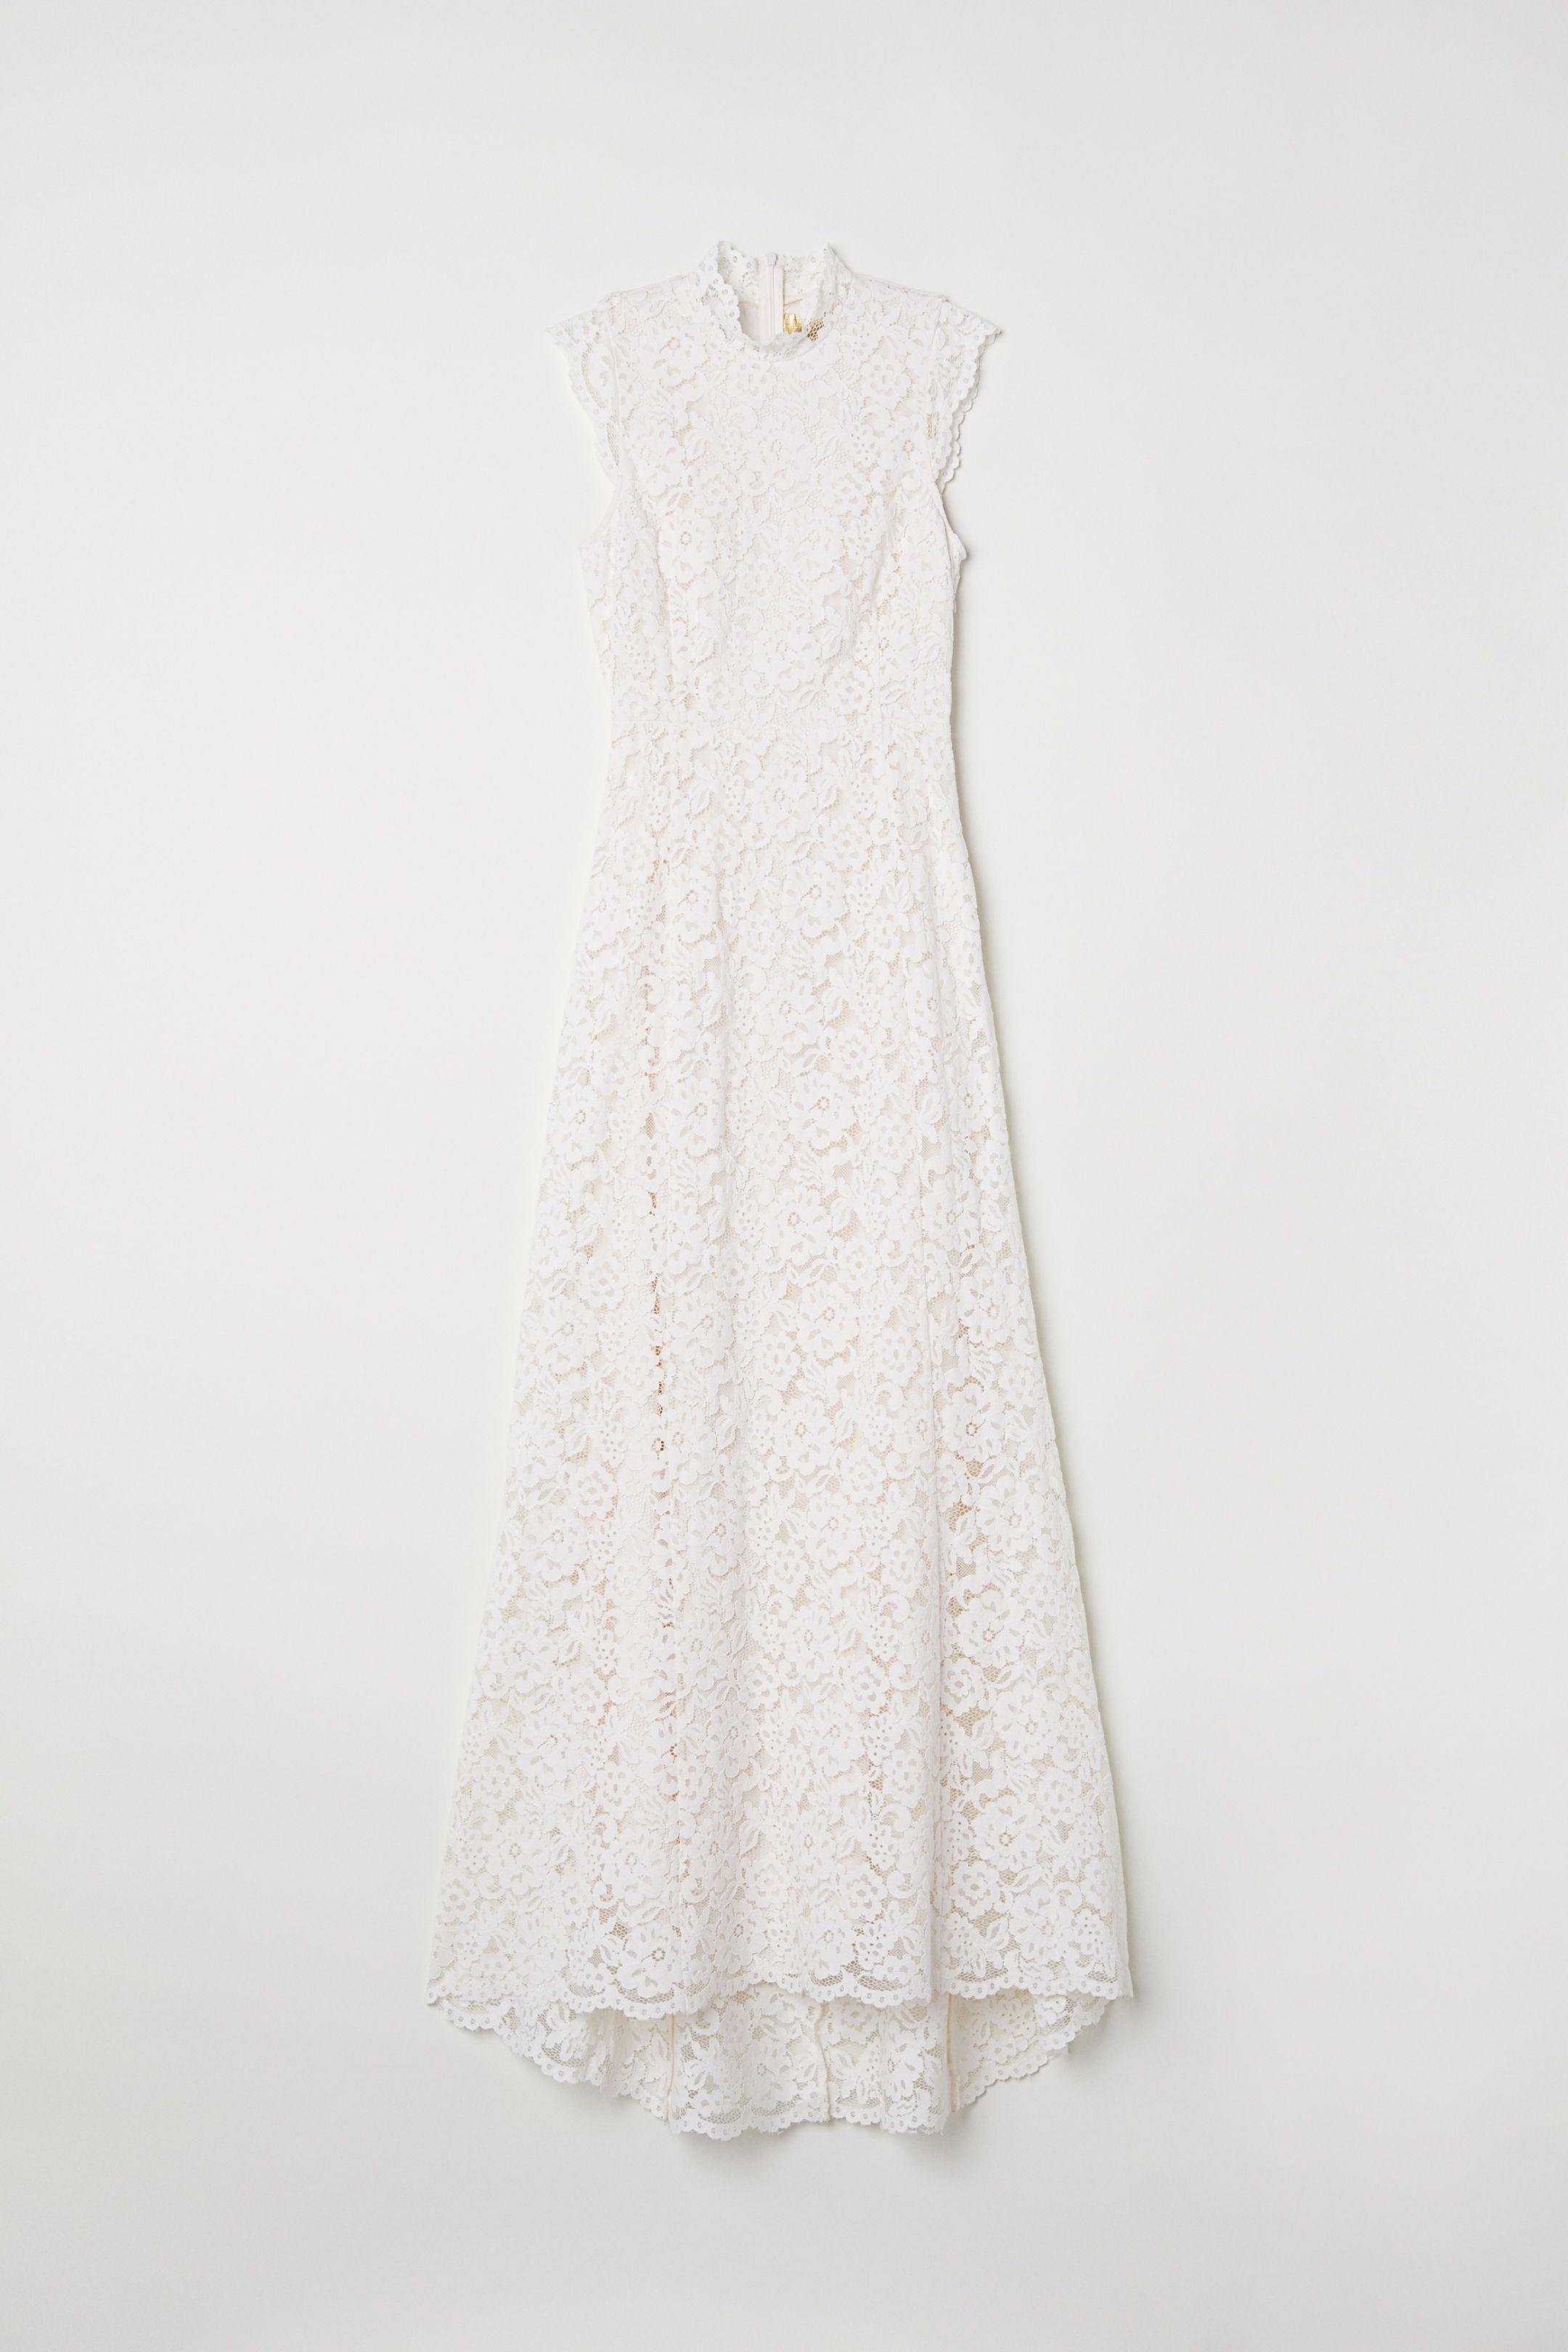 Black lace dress for summer wedding  Long lace dress  Cream  Ladies  HuM  Wedding Ideas  Pinterest